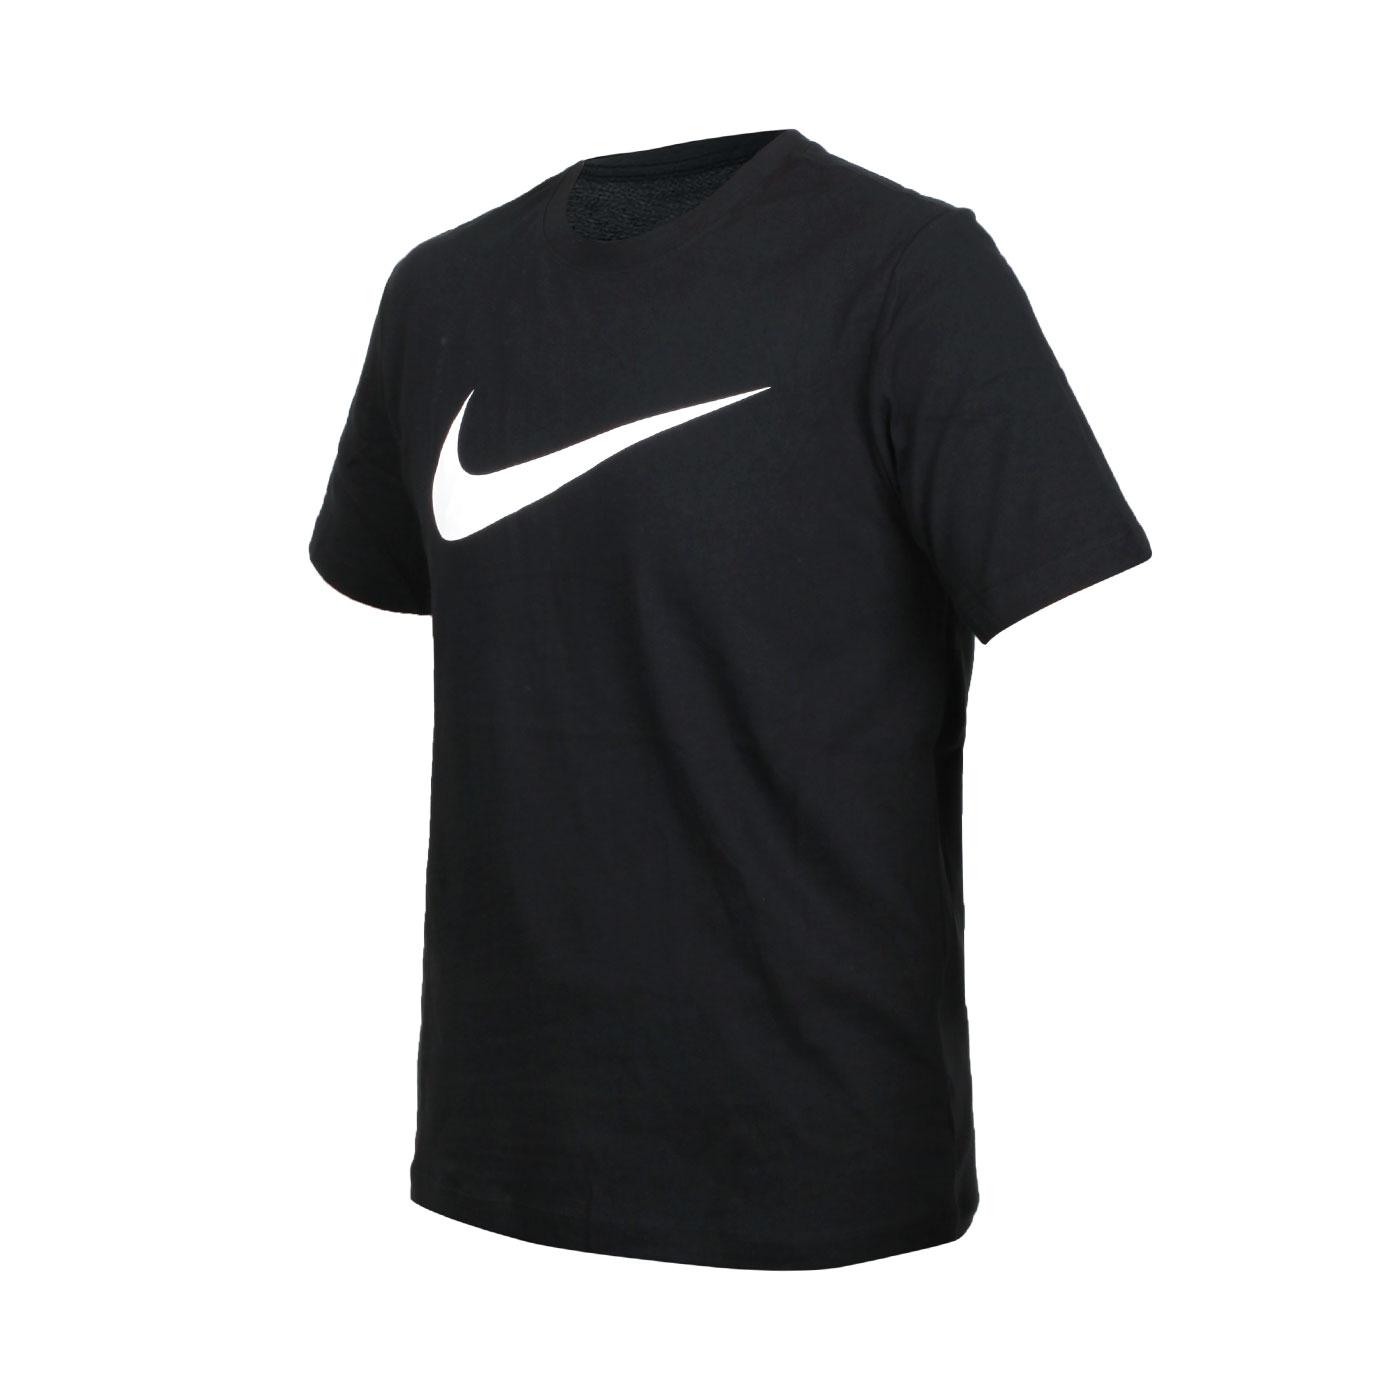 NIKE 男款短袖T恤 DC5095-010 - 黑白